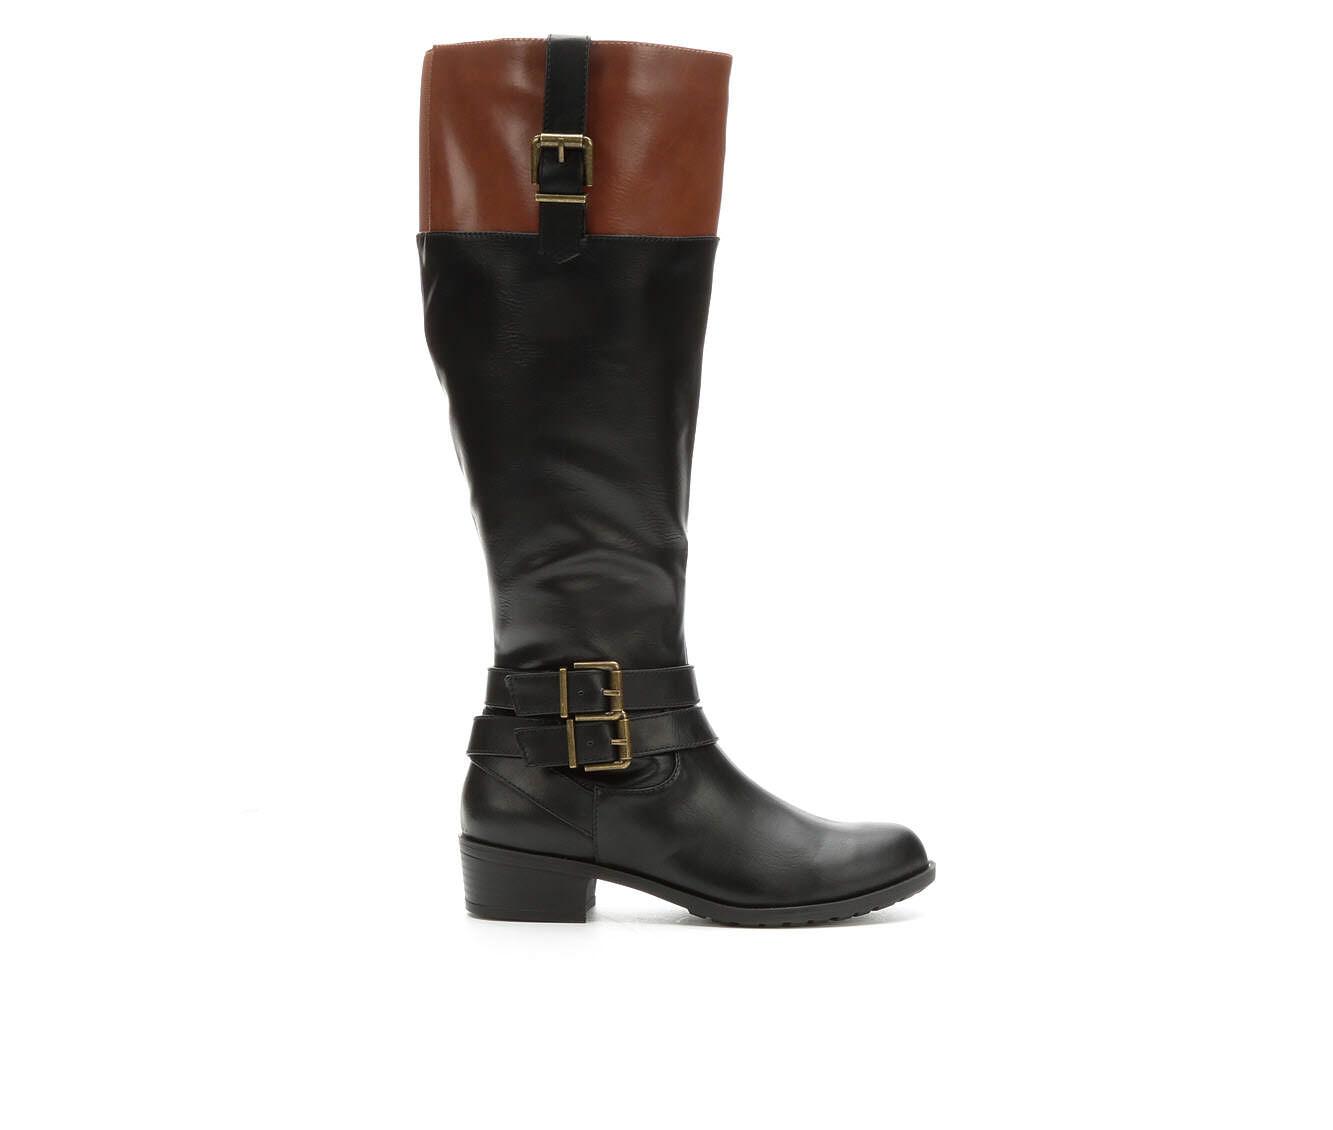 Women's Solanz Grammercy Riding Boots Black/Cognac